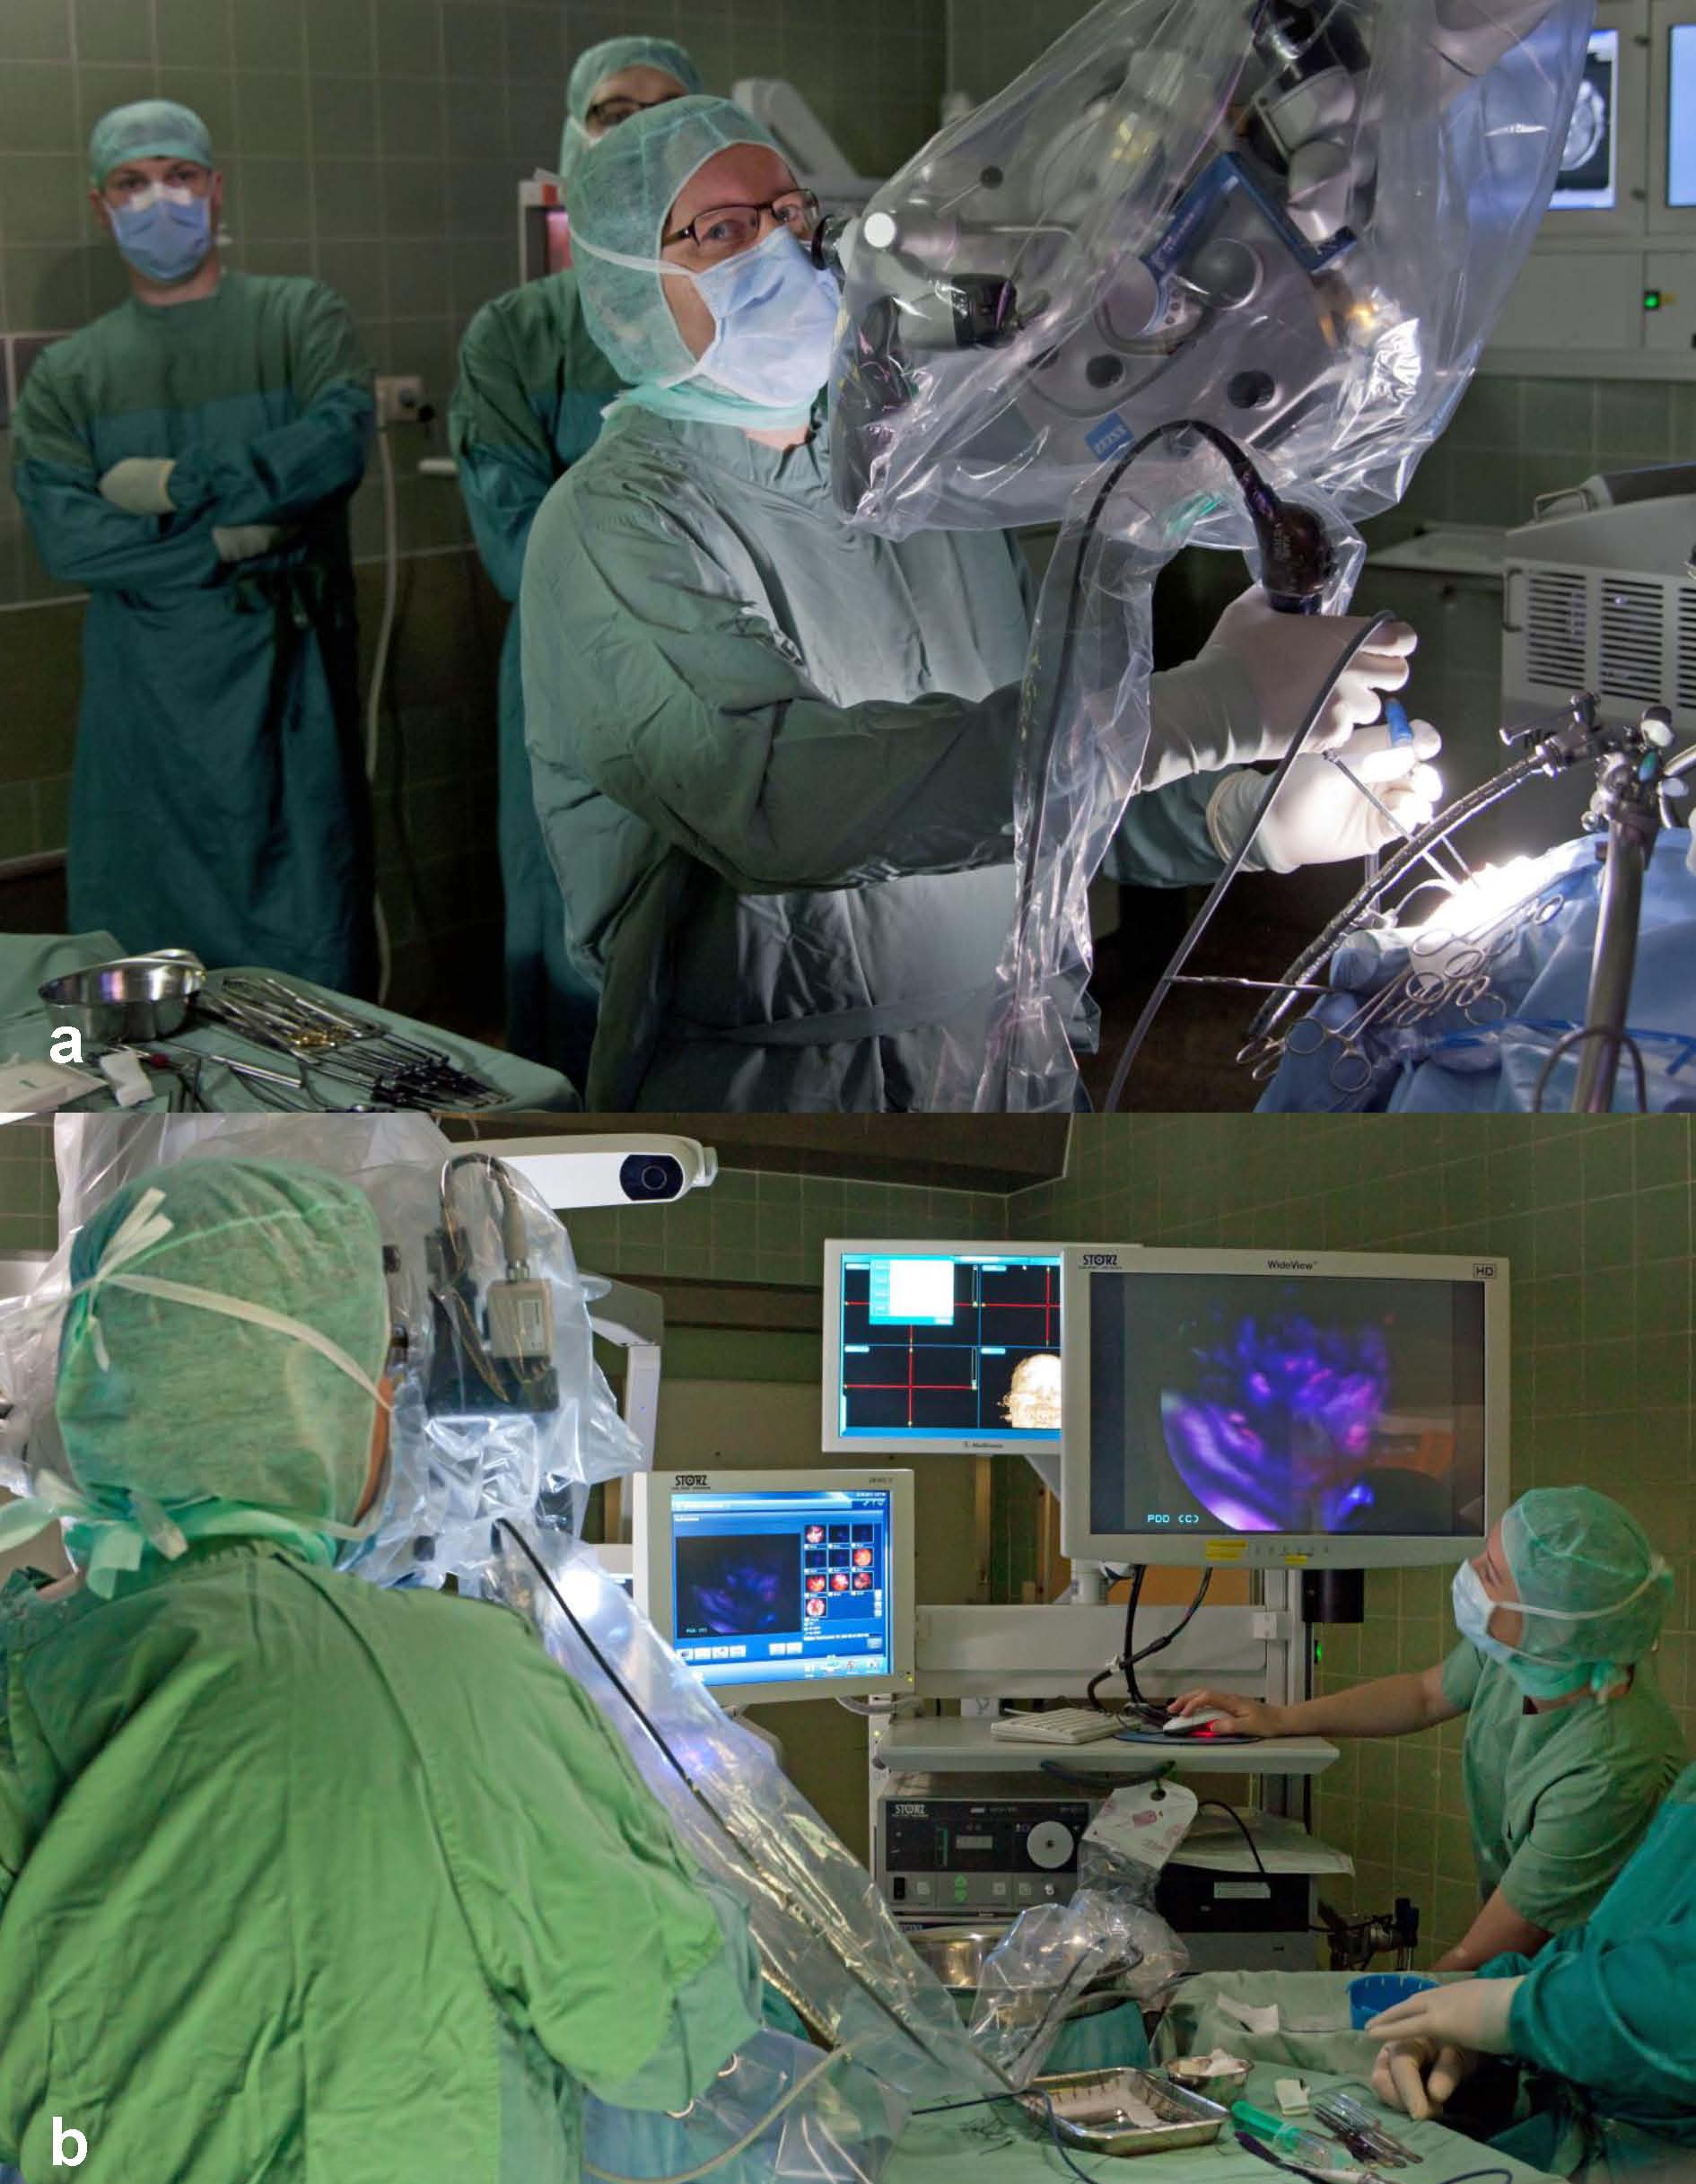 Endoscopic Room: Skull Base Endoscopic-Assisted Surgery